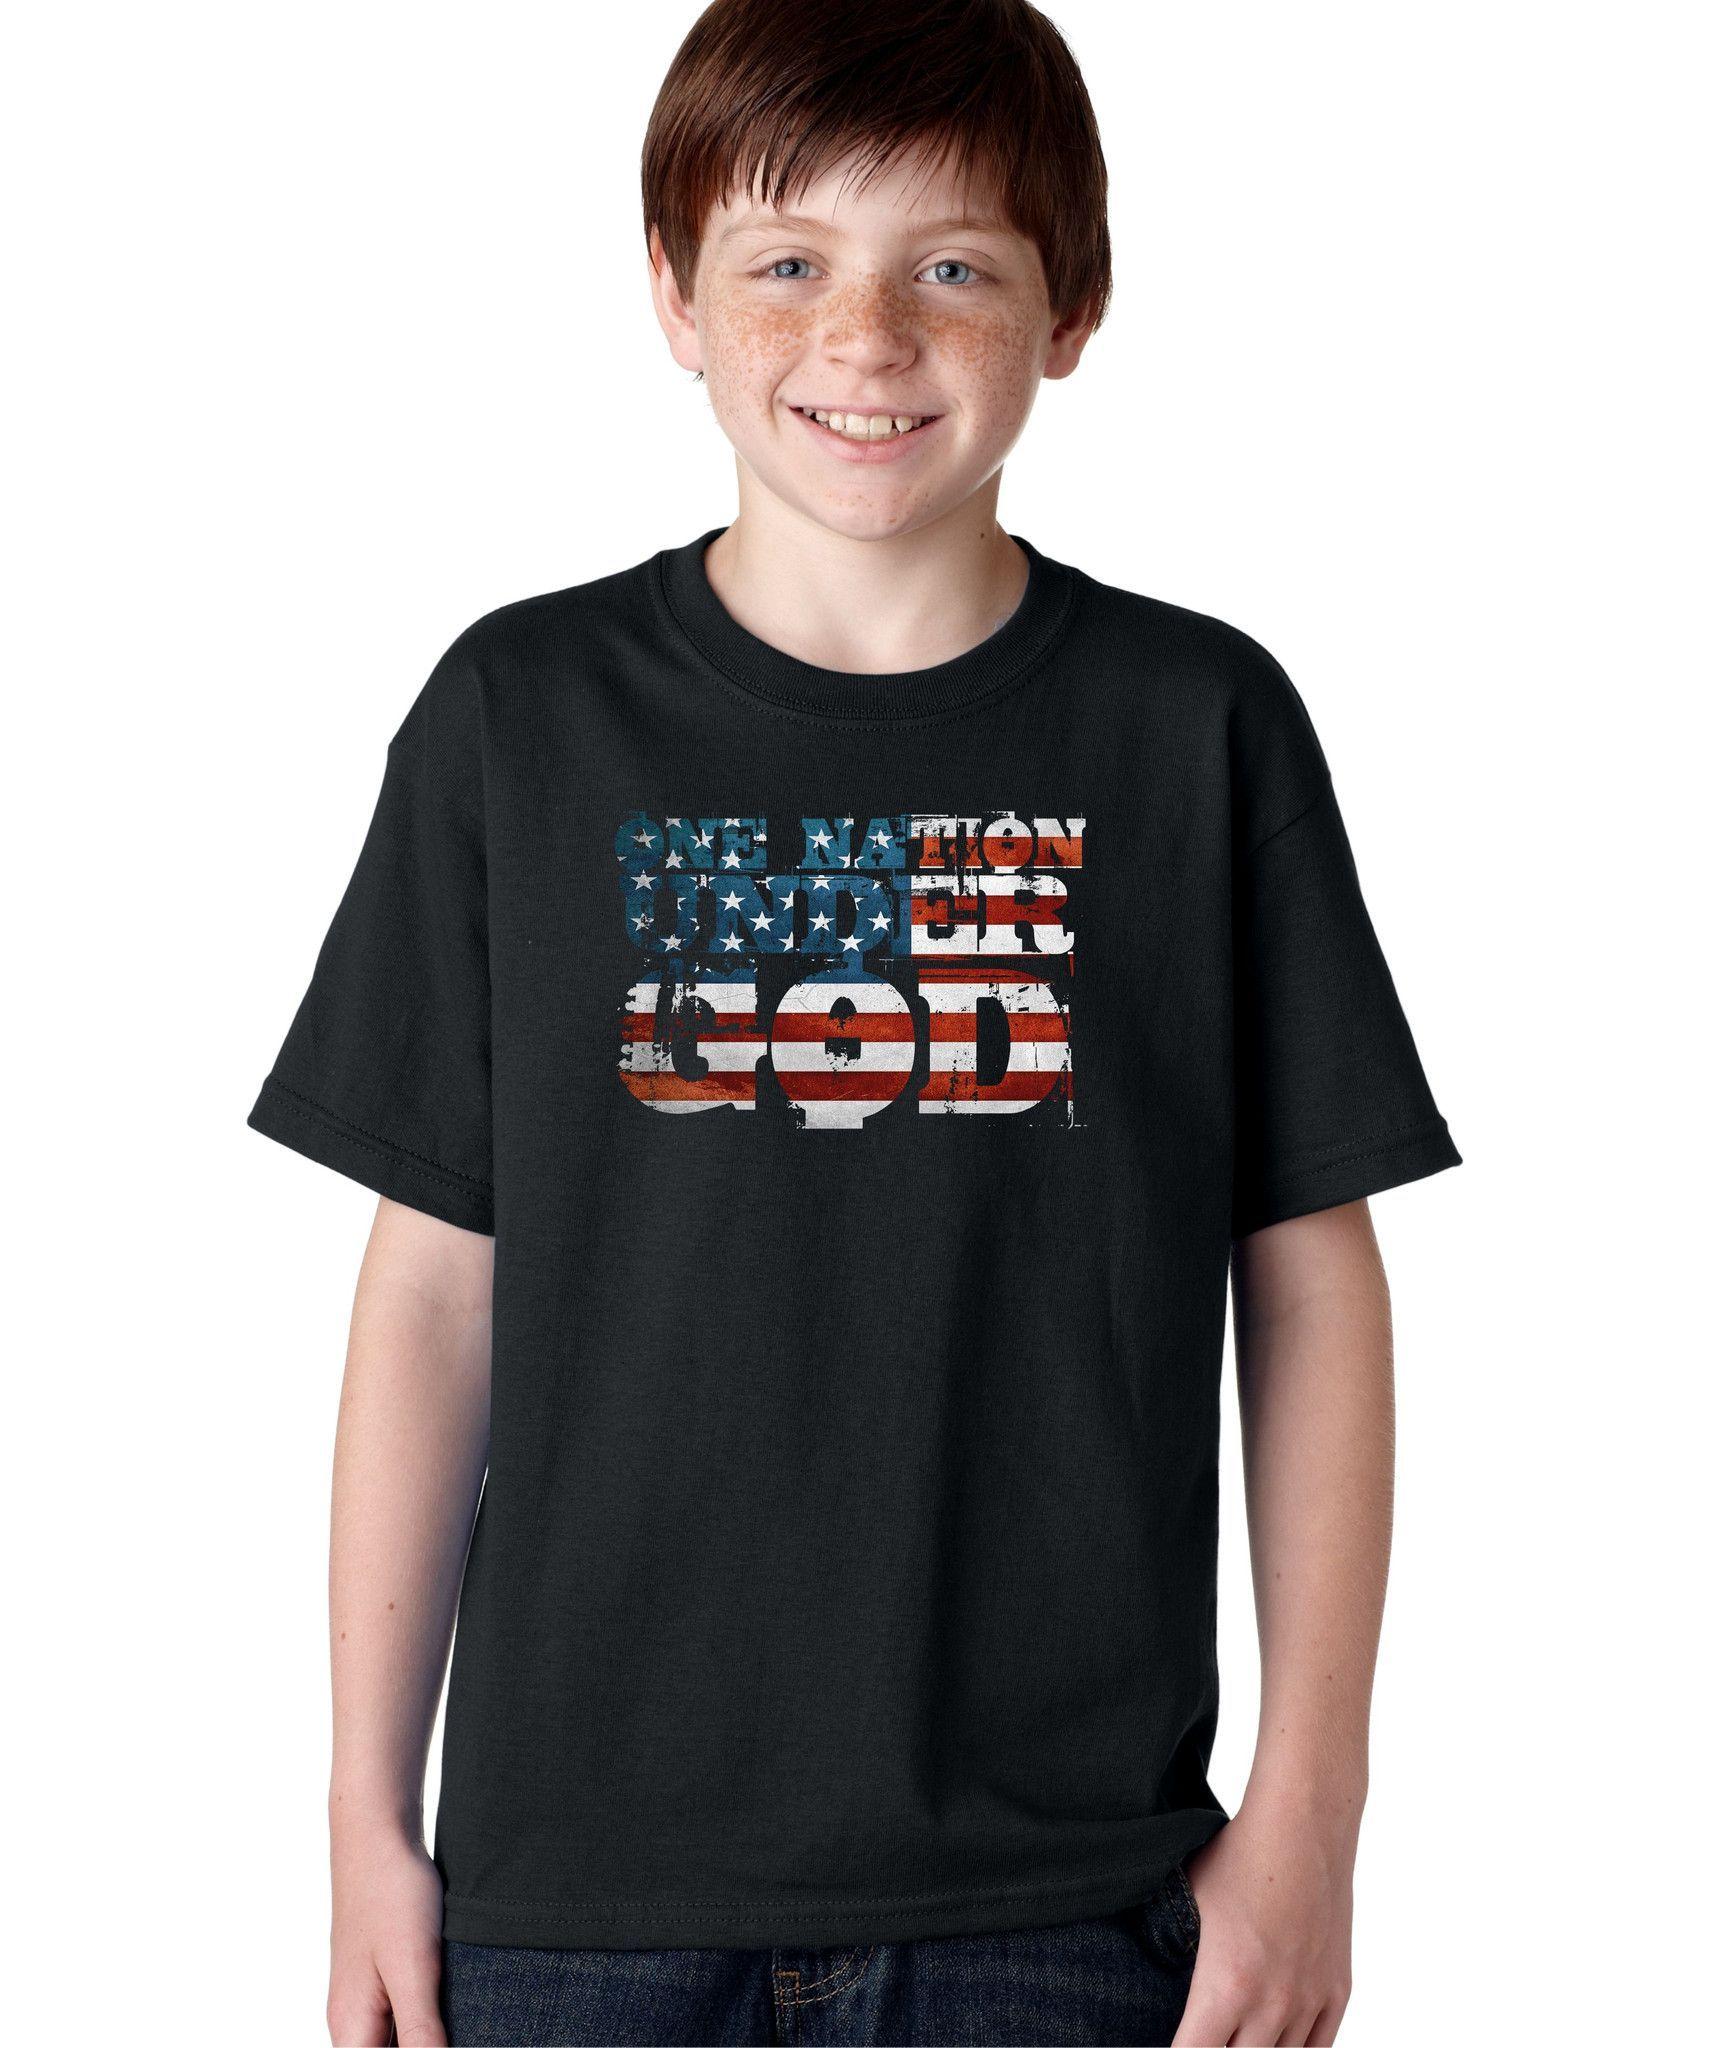 445c0b232 One Nation Under God America Patriot Pledge Of Allegiance USA Flag T-shirt  for Kids